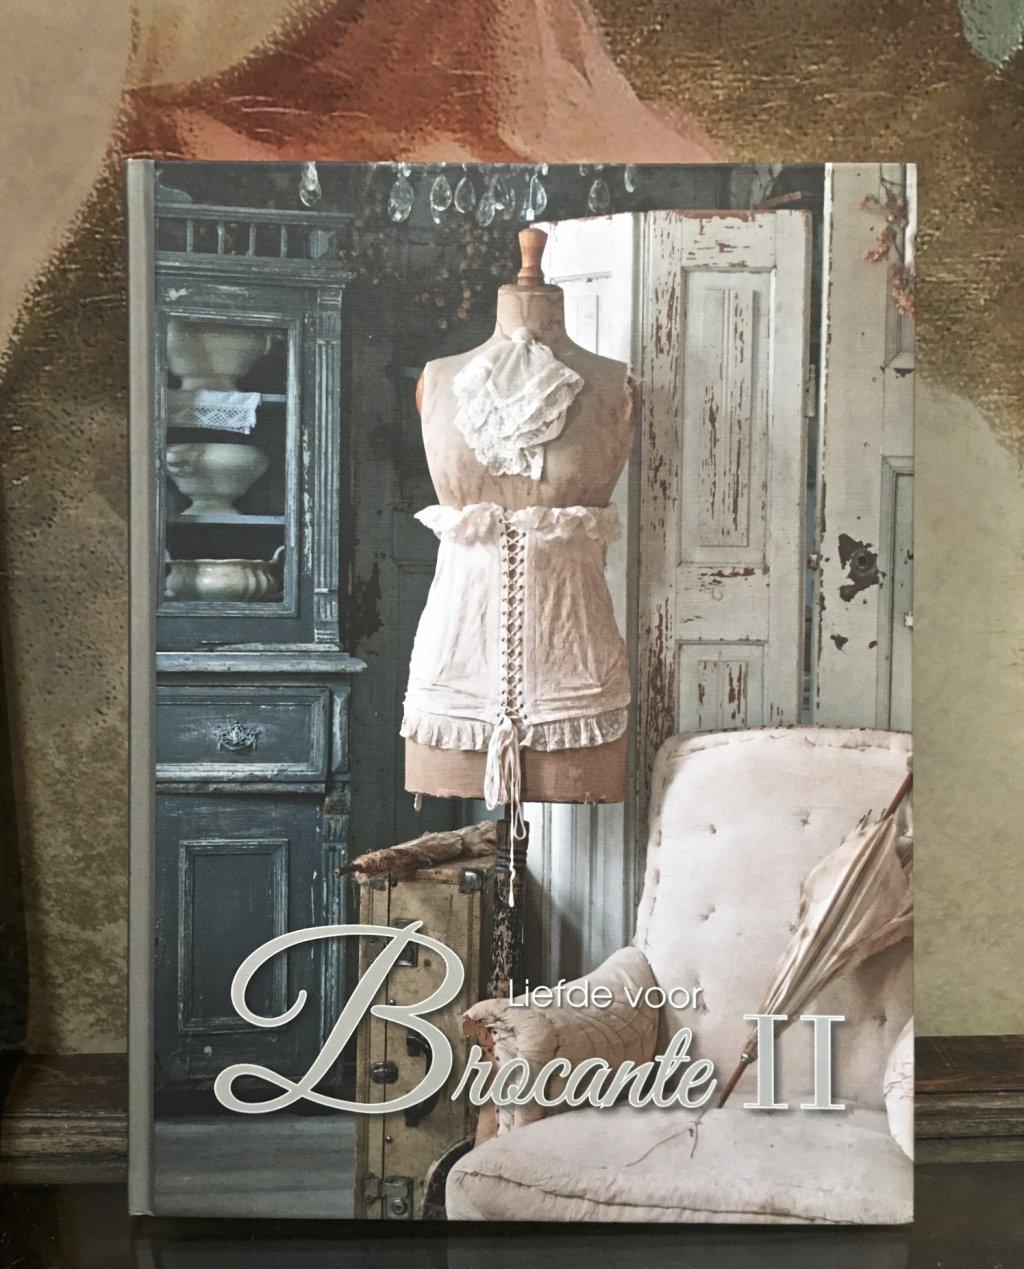 Loving Brocante - Part 2